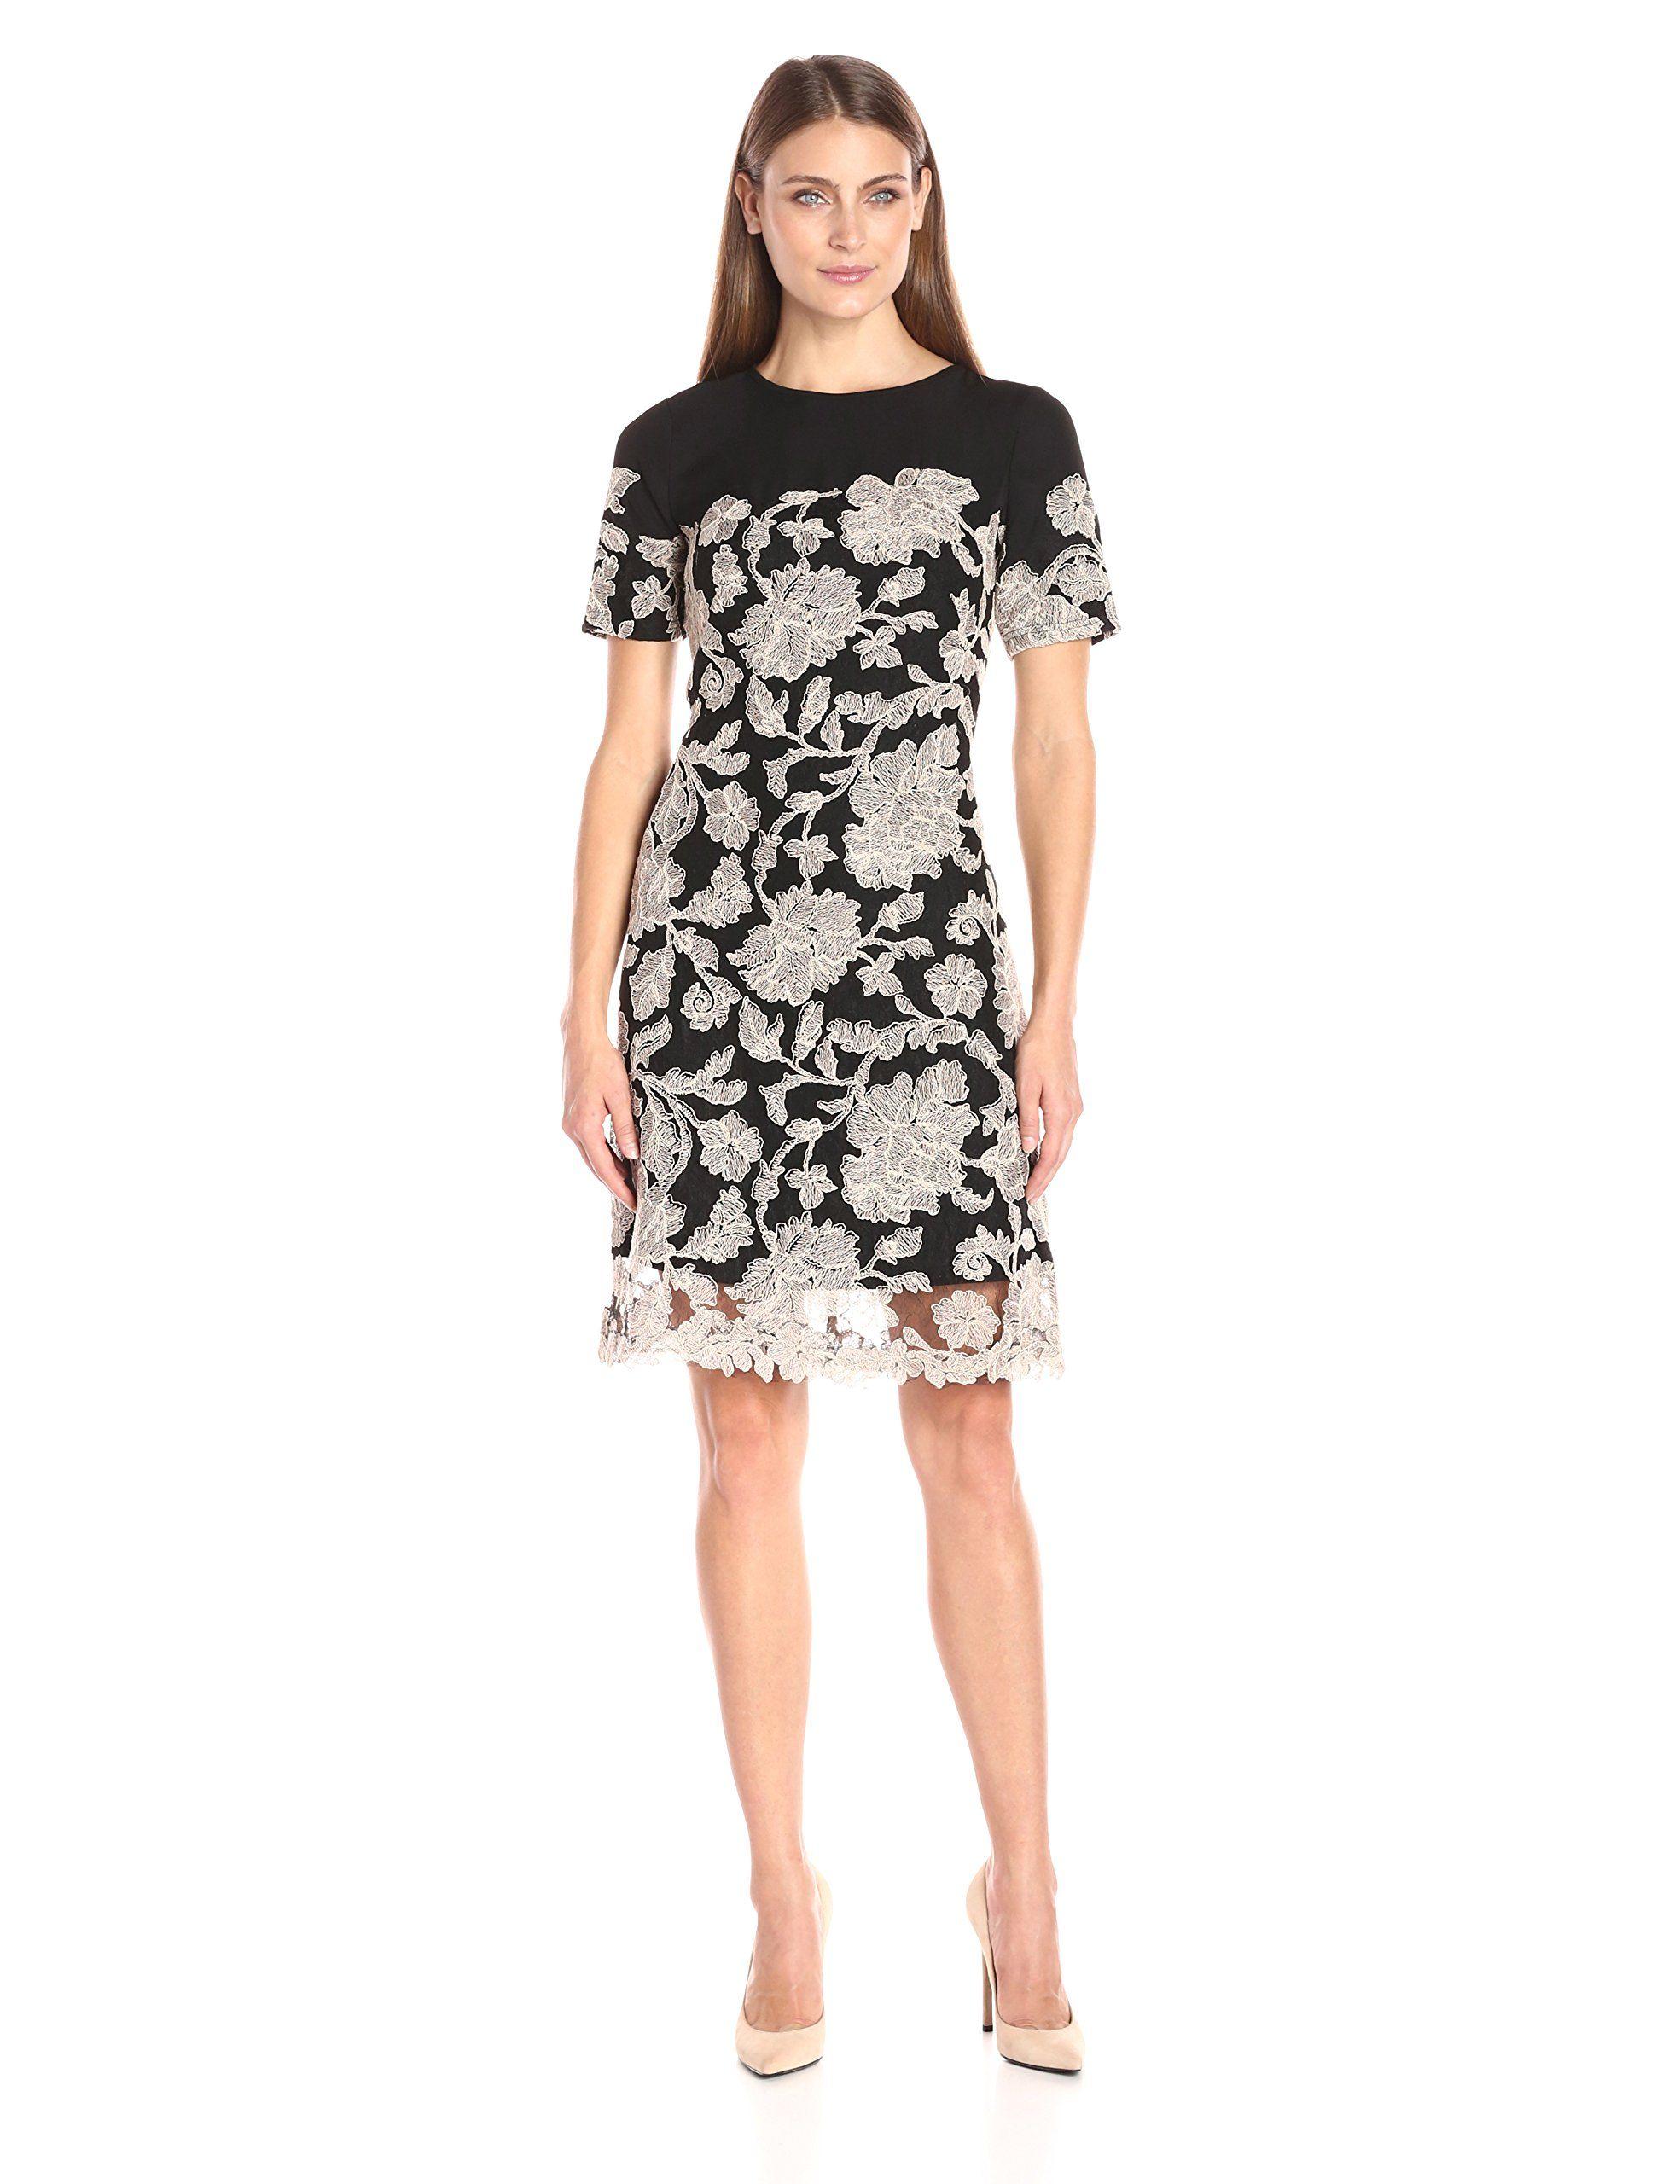 Tadashi shoji womenus shortsleeve dress in neoprene with peony lace